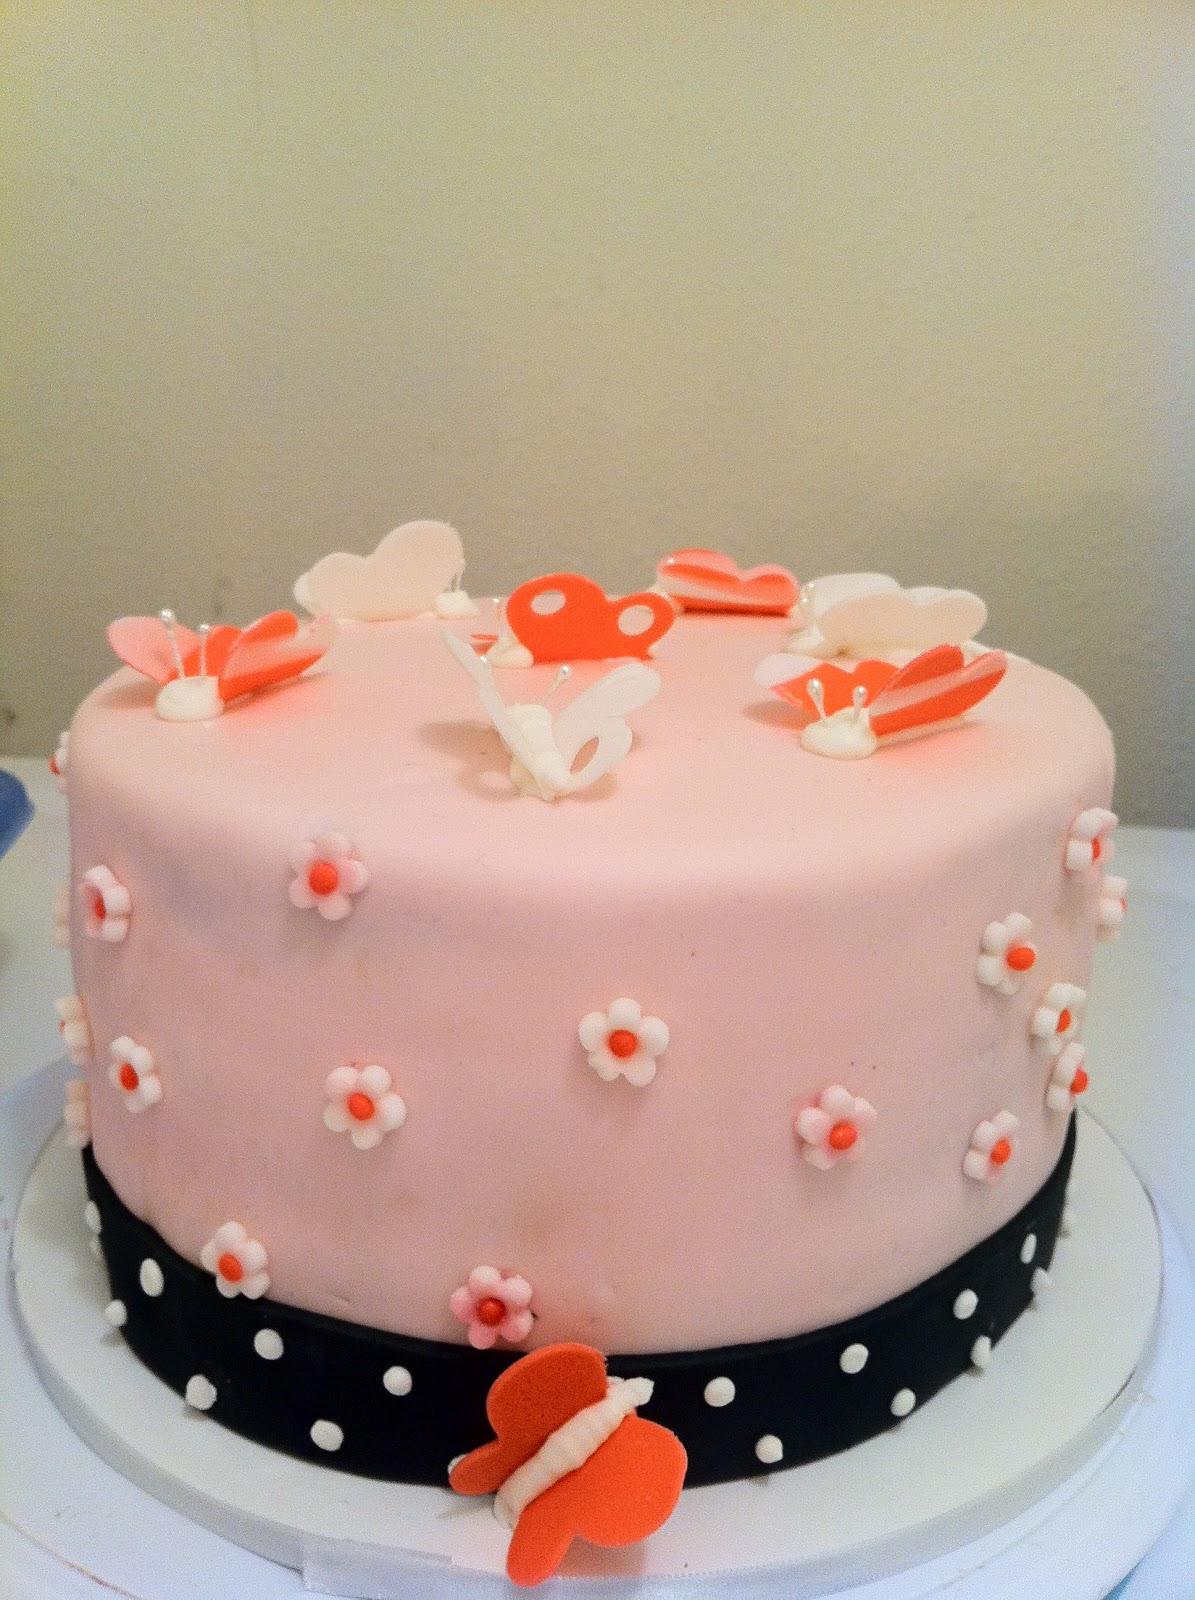 Cake Art By Jenn : Jen Takes the Cake: Cake Art